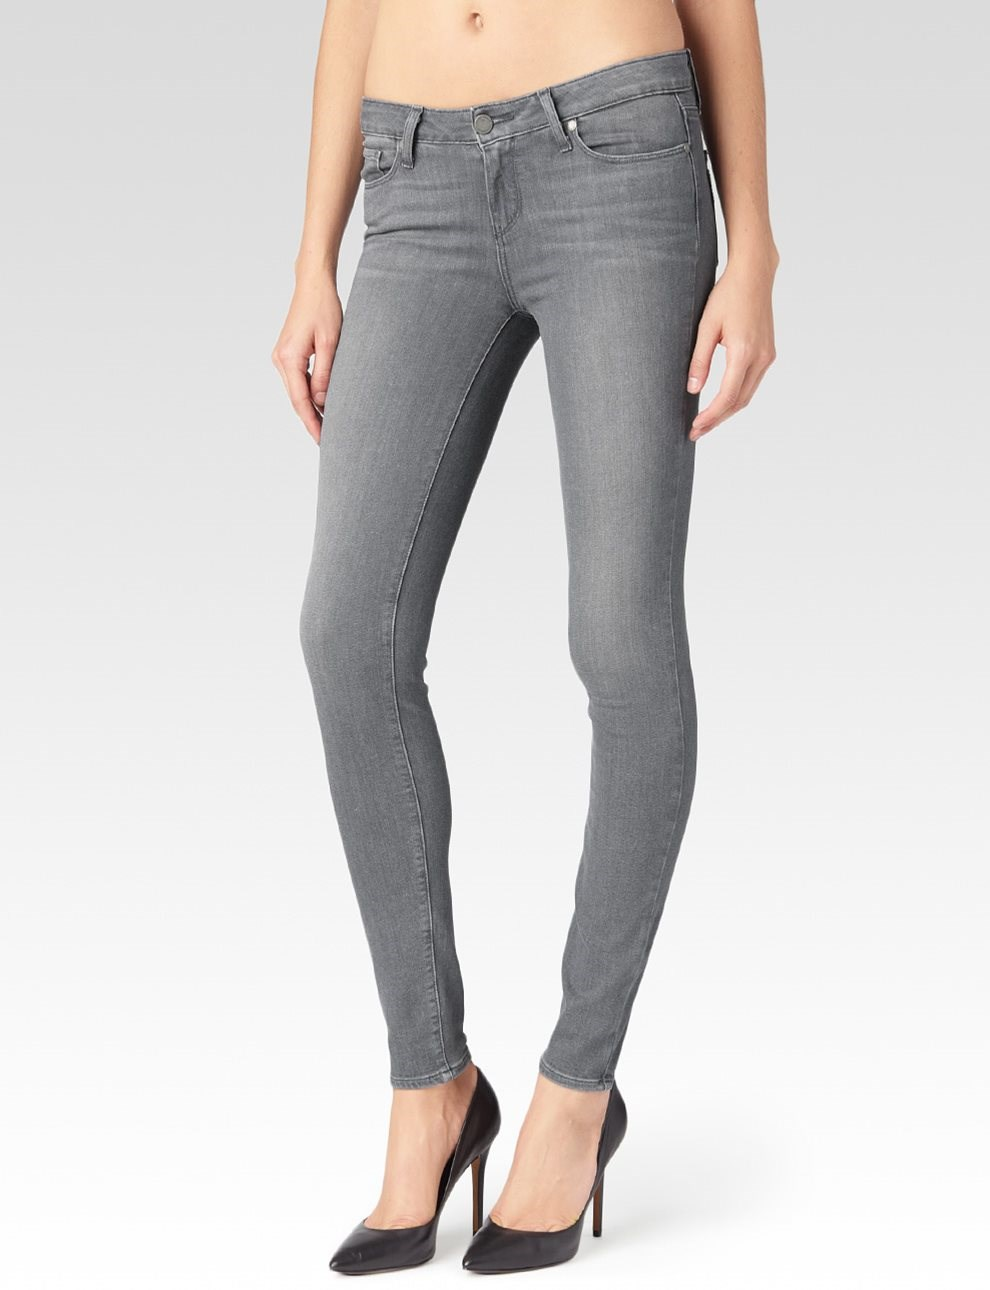 PAIGE Womens Verdugo Ultra Skinny Jeans-Silvie